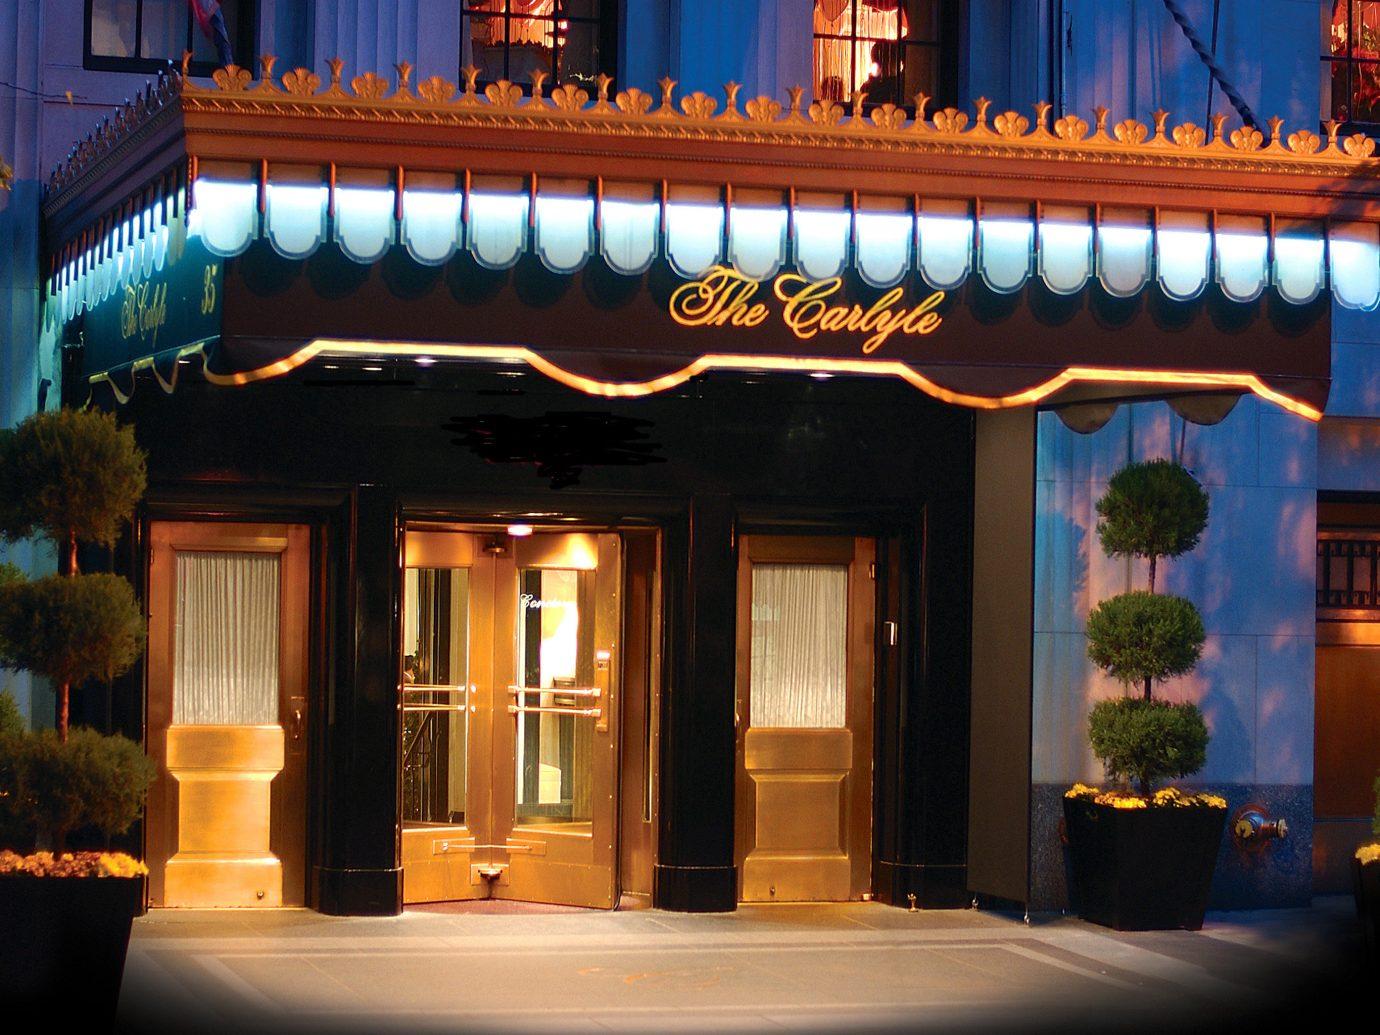 Exterior Hotels Jetsetter Guides Travel Tips Trip Ideas outdoor night house Architecture evening lighting restaurant interior design facade